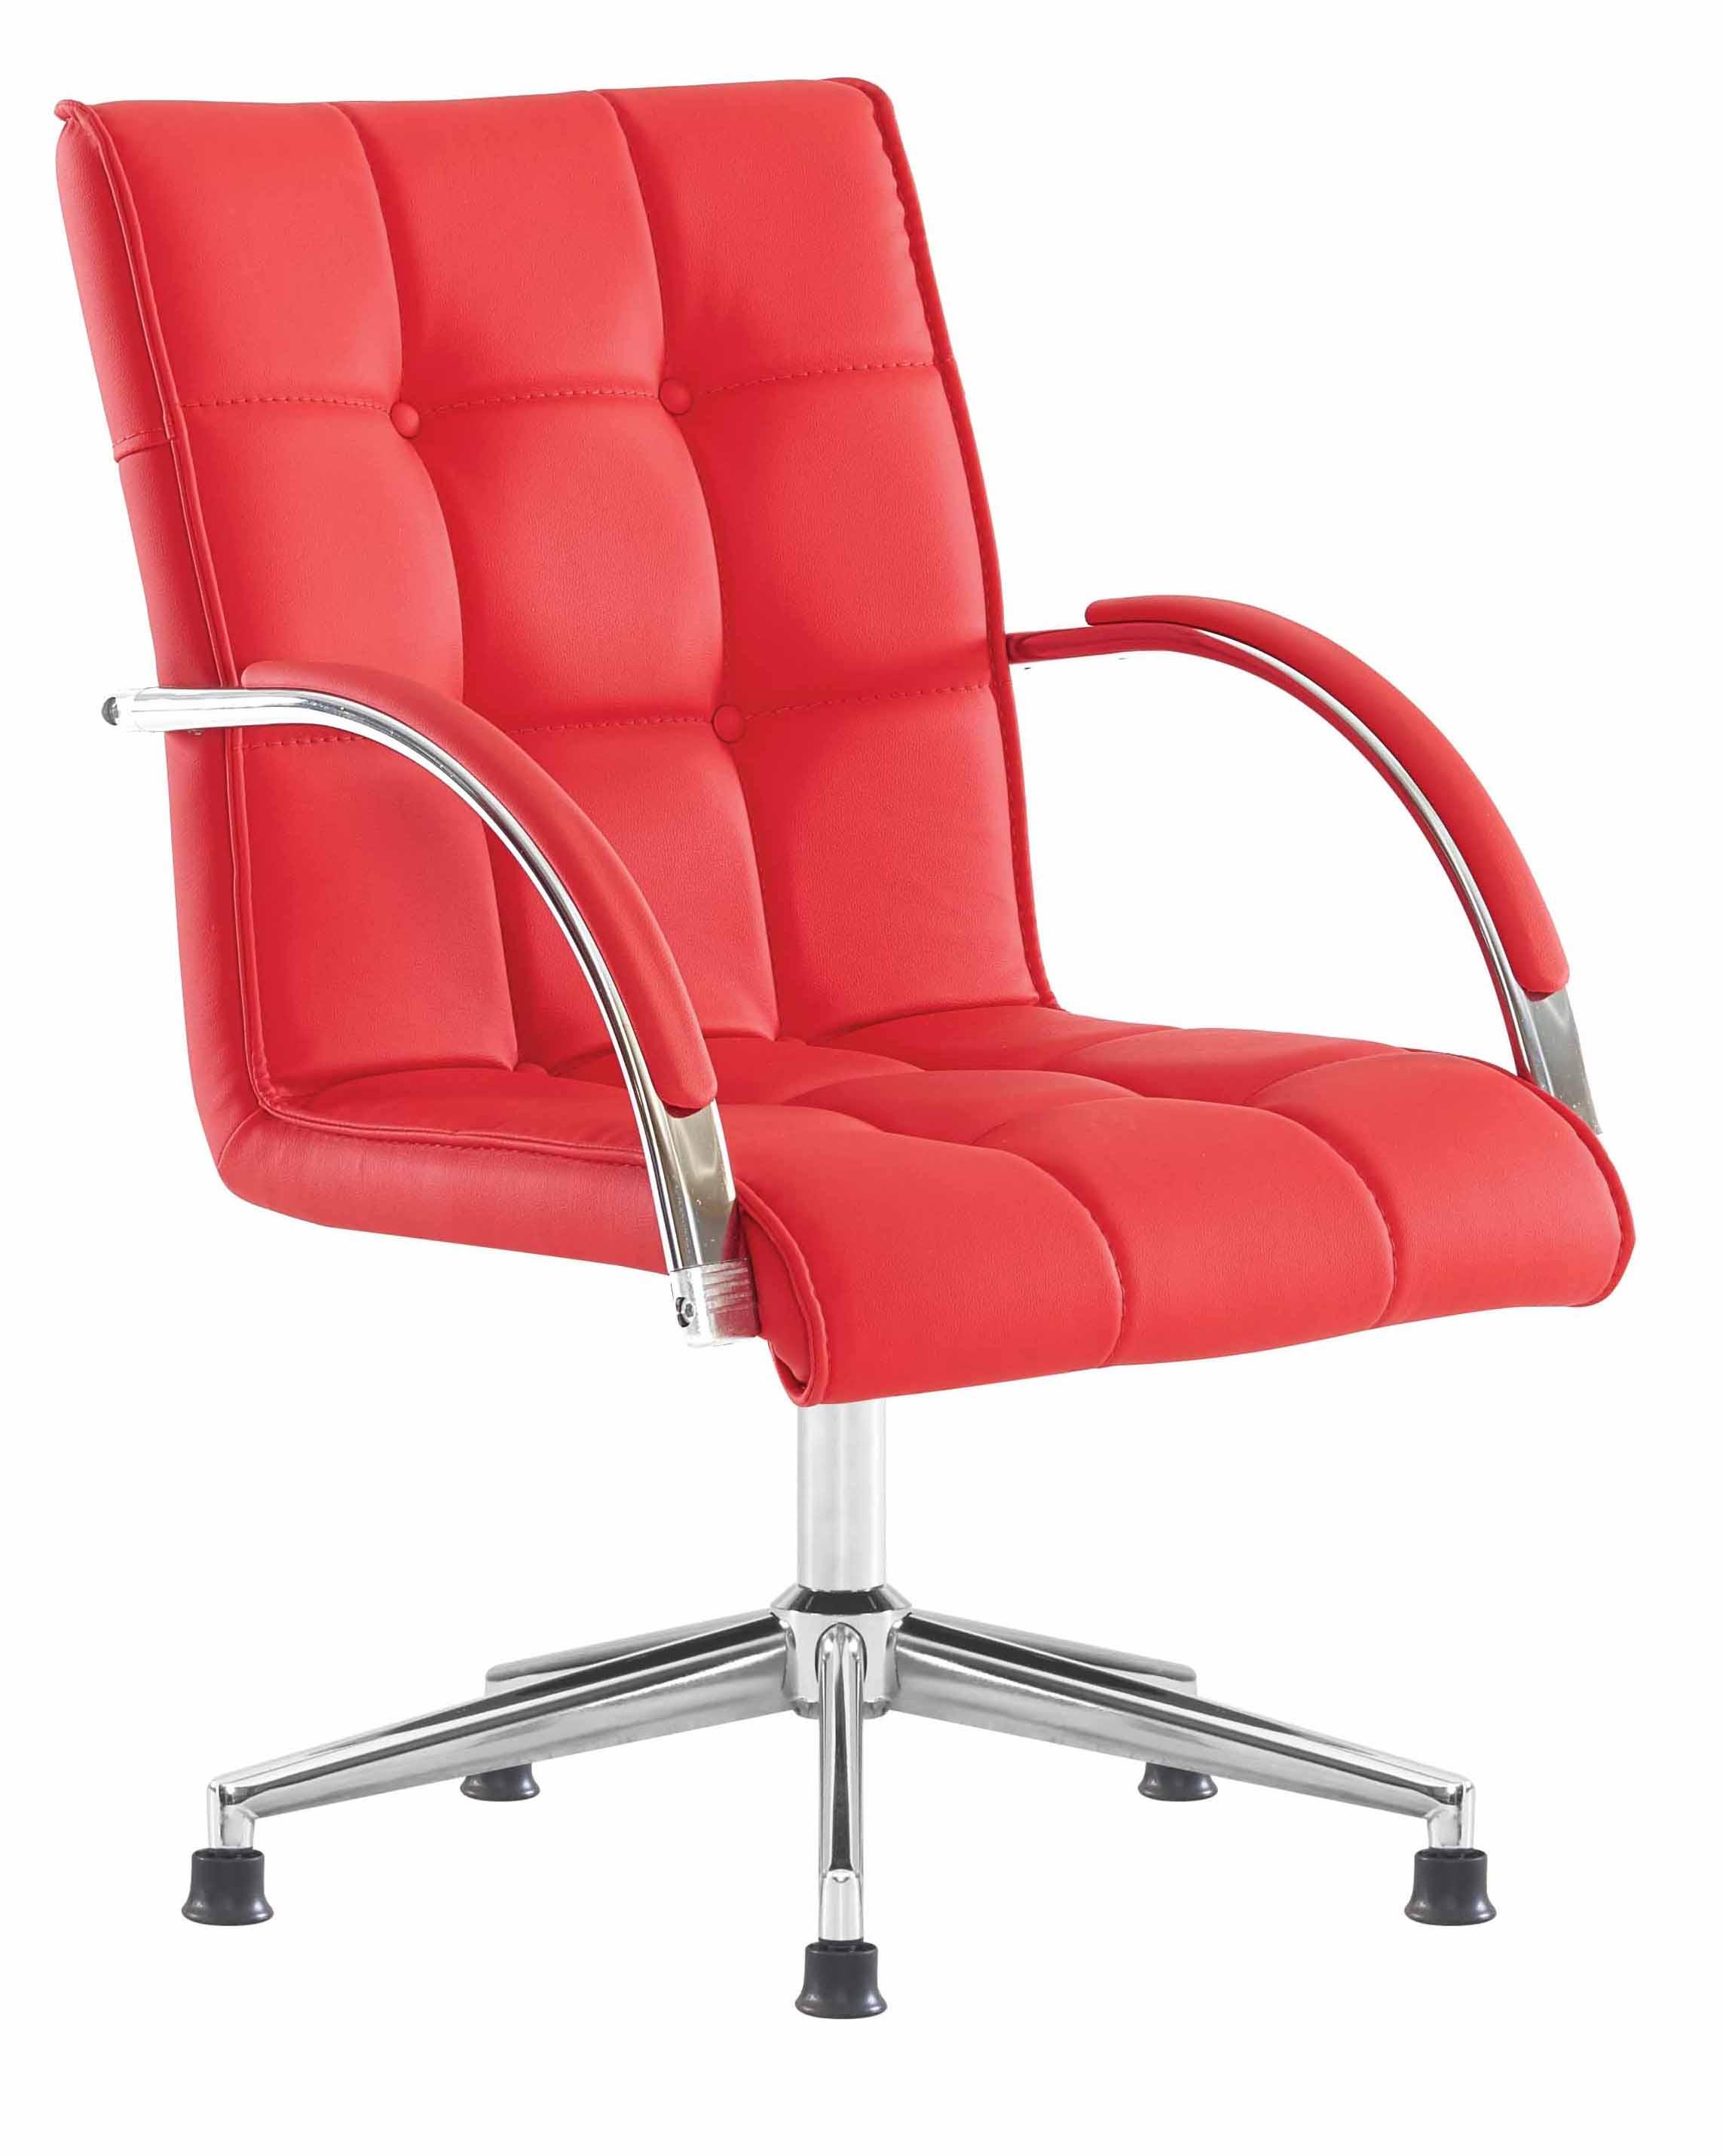 b rostuhl rot mit metallfu armlehne g nstig kaufen m bel star. Black Bedroom Furniture Sets. Home Design Ideas